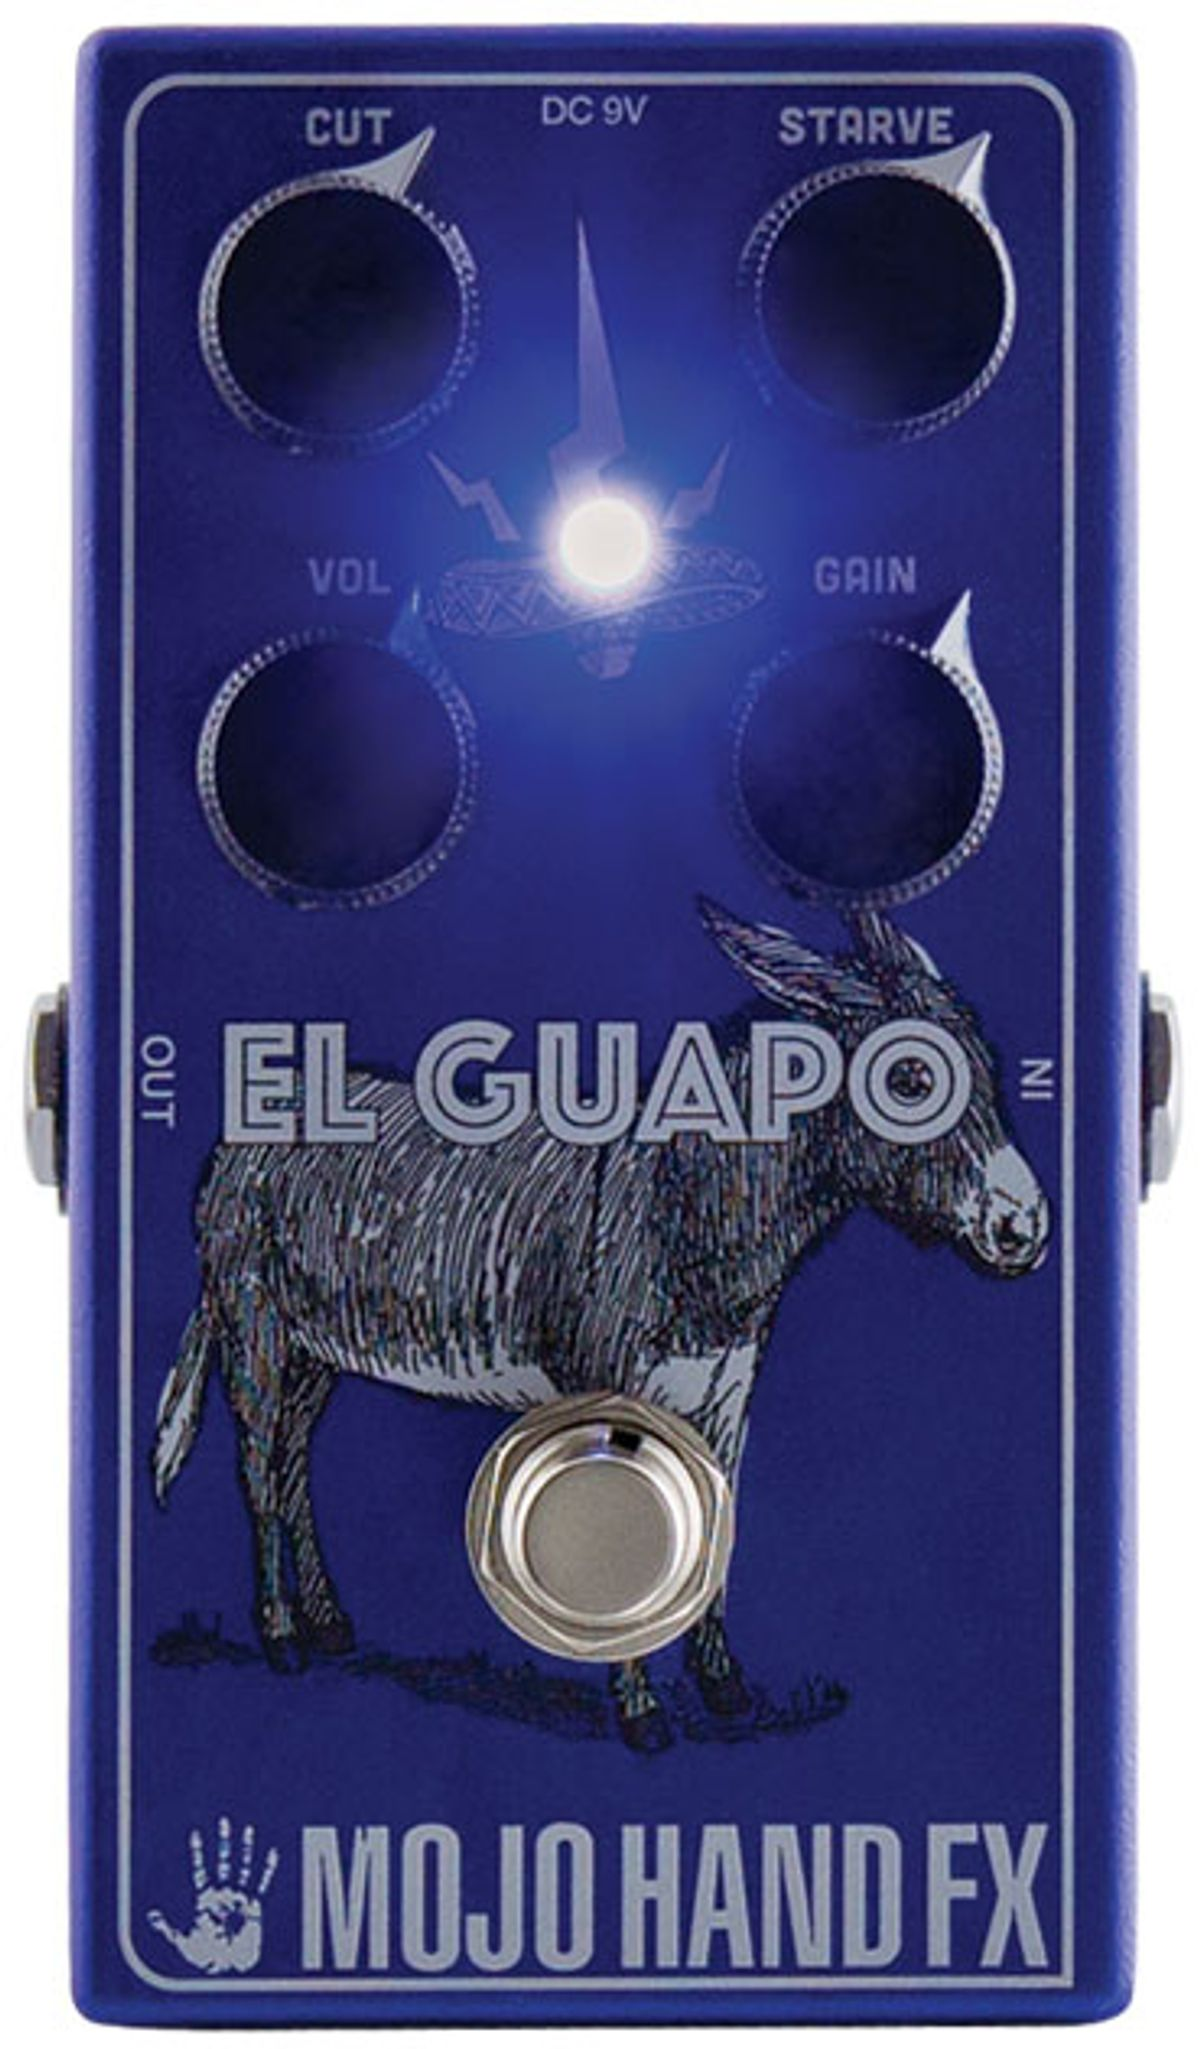 Mojo Hand Fx El Guapo Review